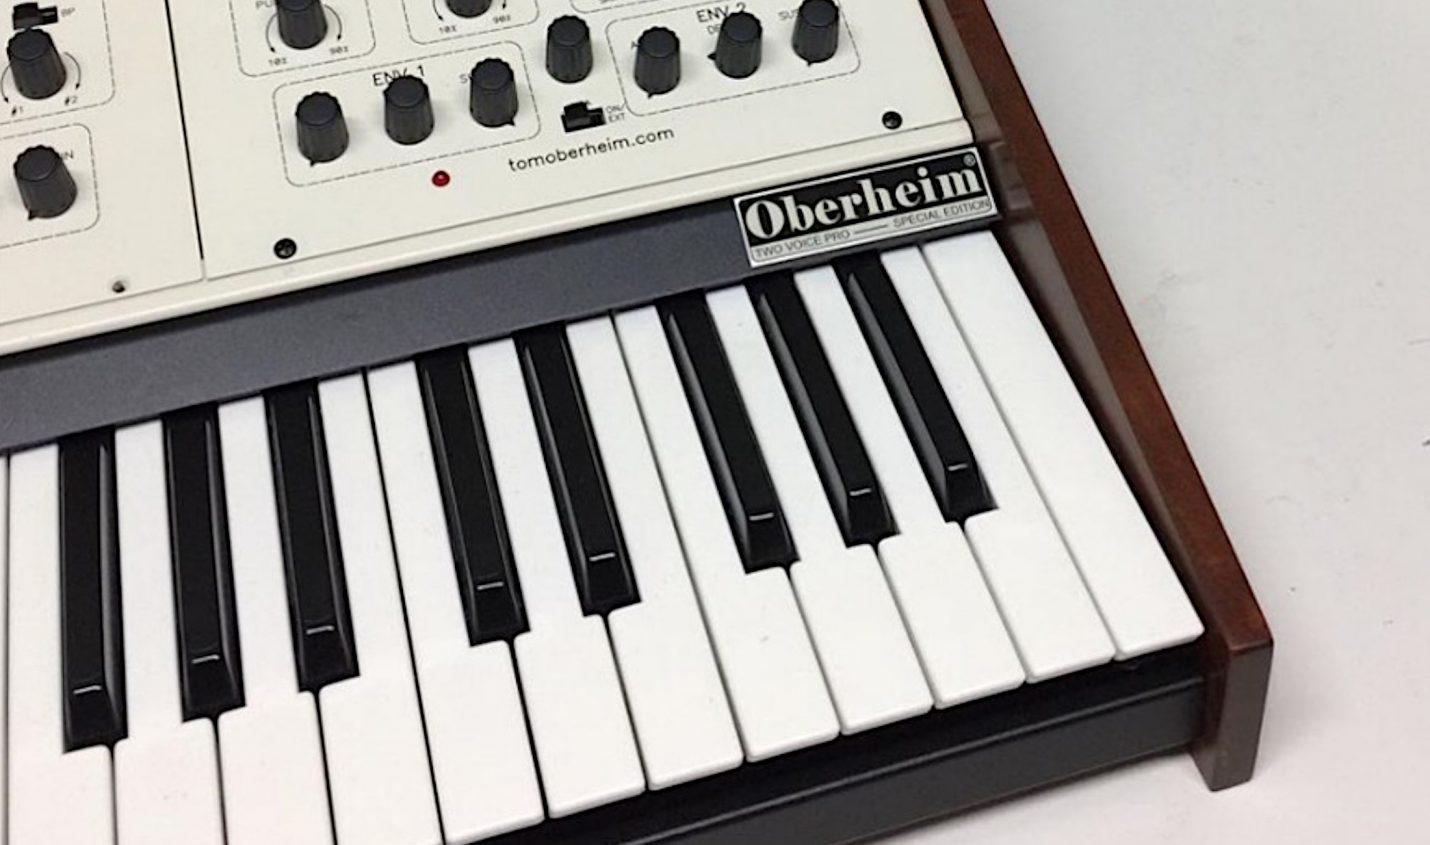 Oberheim TVS Pro als Special Editition angekündigt